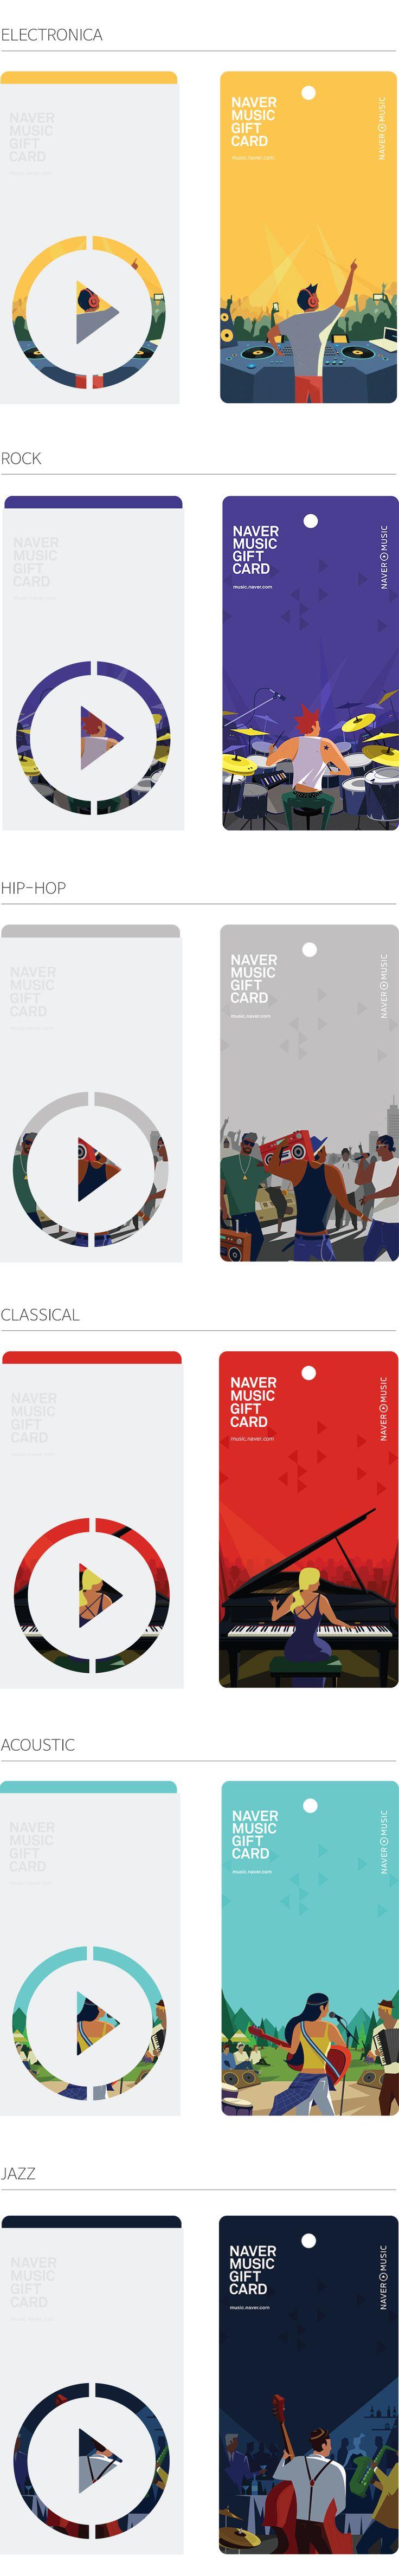 NAVER MUSIC GIFT CARDS on Behance